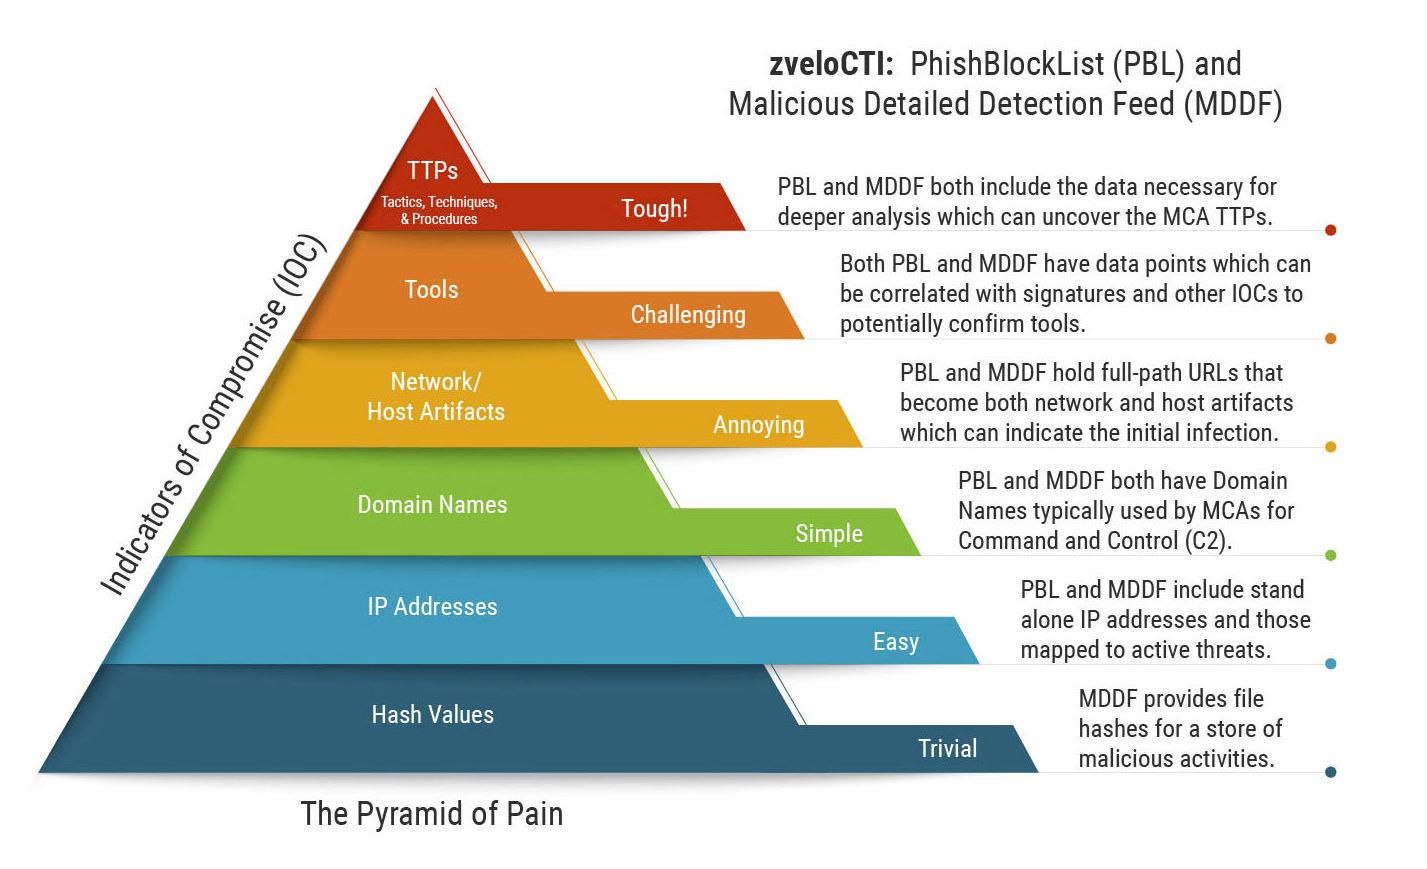 IOC-Pyramid-of-Pain-zvelo-phishing-detection-malicious-detection-threat-intelligence-feeds